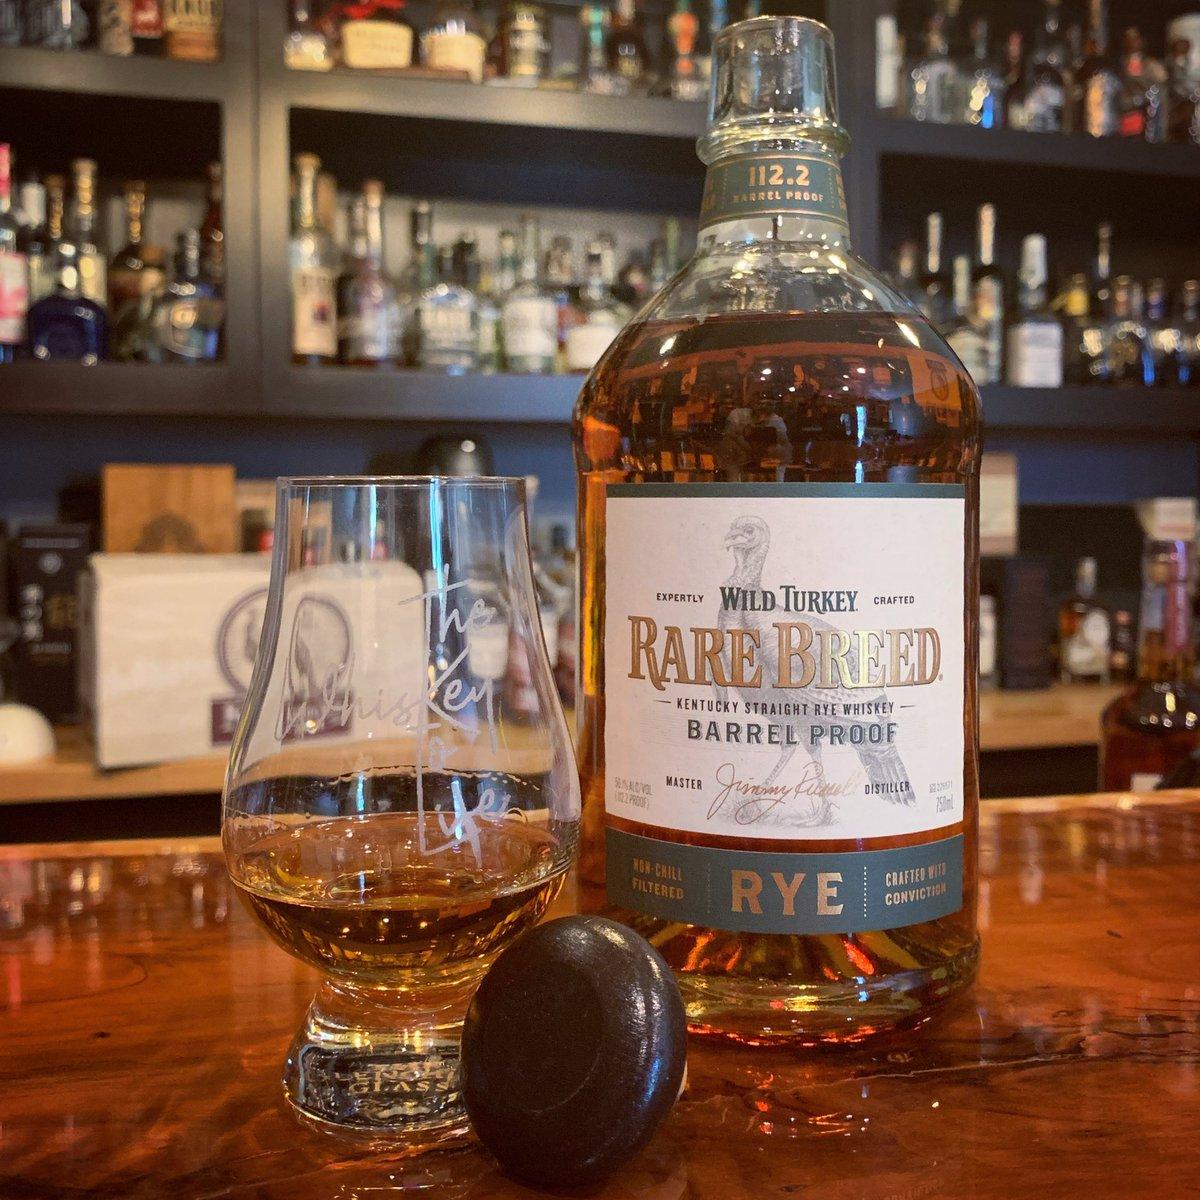 Holy mother of all that's good in the world, this is incredible whiskey. Best release of the year. MKBIB level good.   #wildturkey #whiskey #whisky #whiskeytolife #rye #ryewhiskey #turkey #gobblegobble #jimmyrussell #rarebreed #rarebreedryepic.twitter.com/4ljYOhKZvx